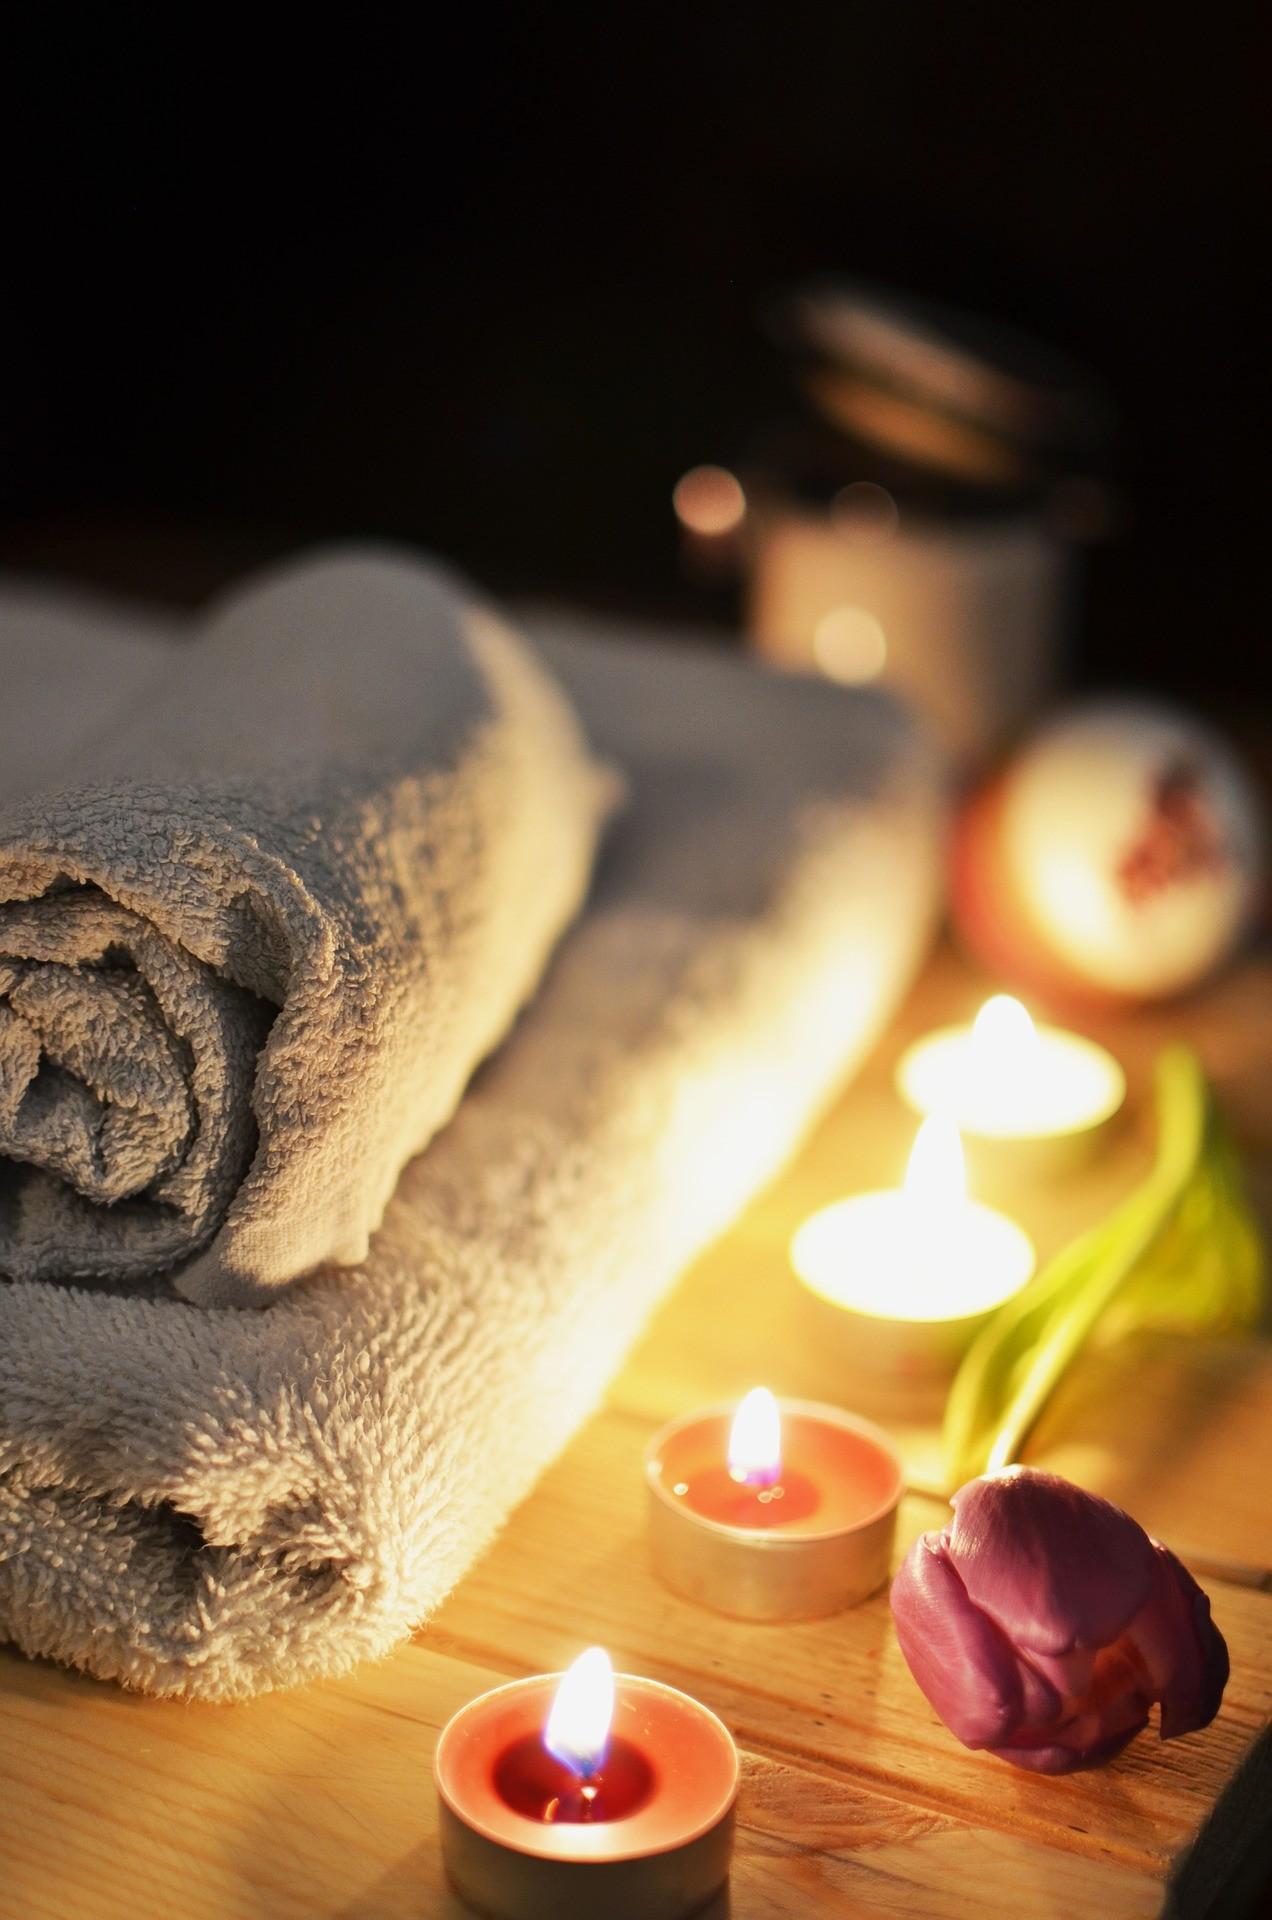 Massage therapy 1584711 1920